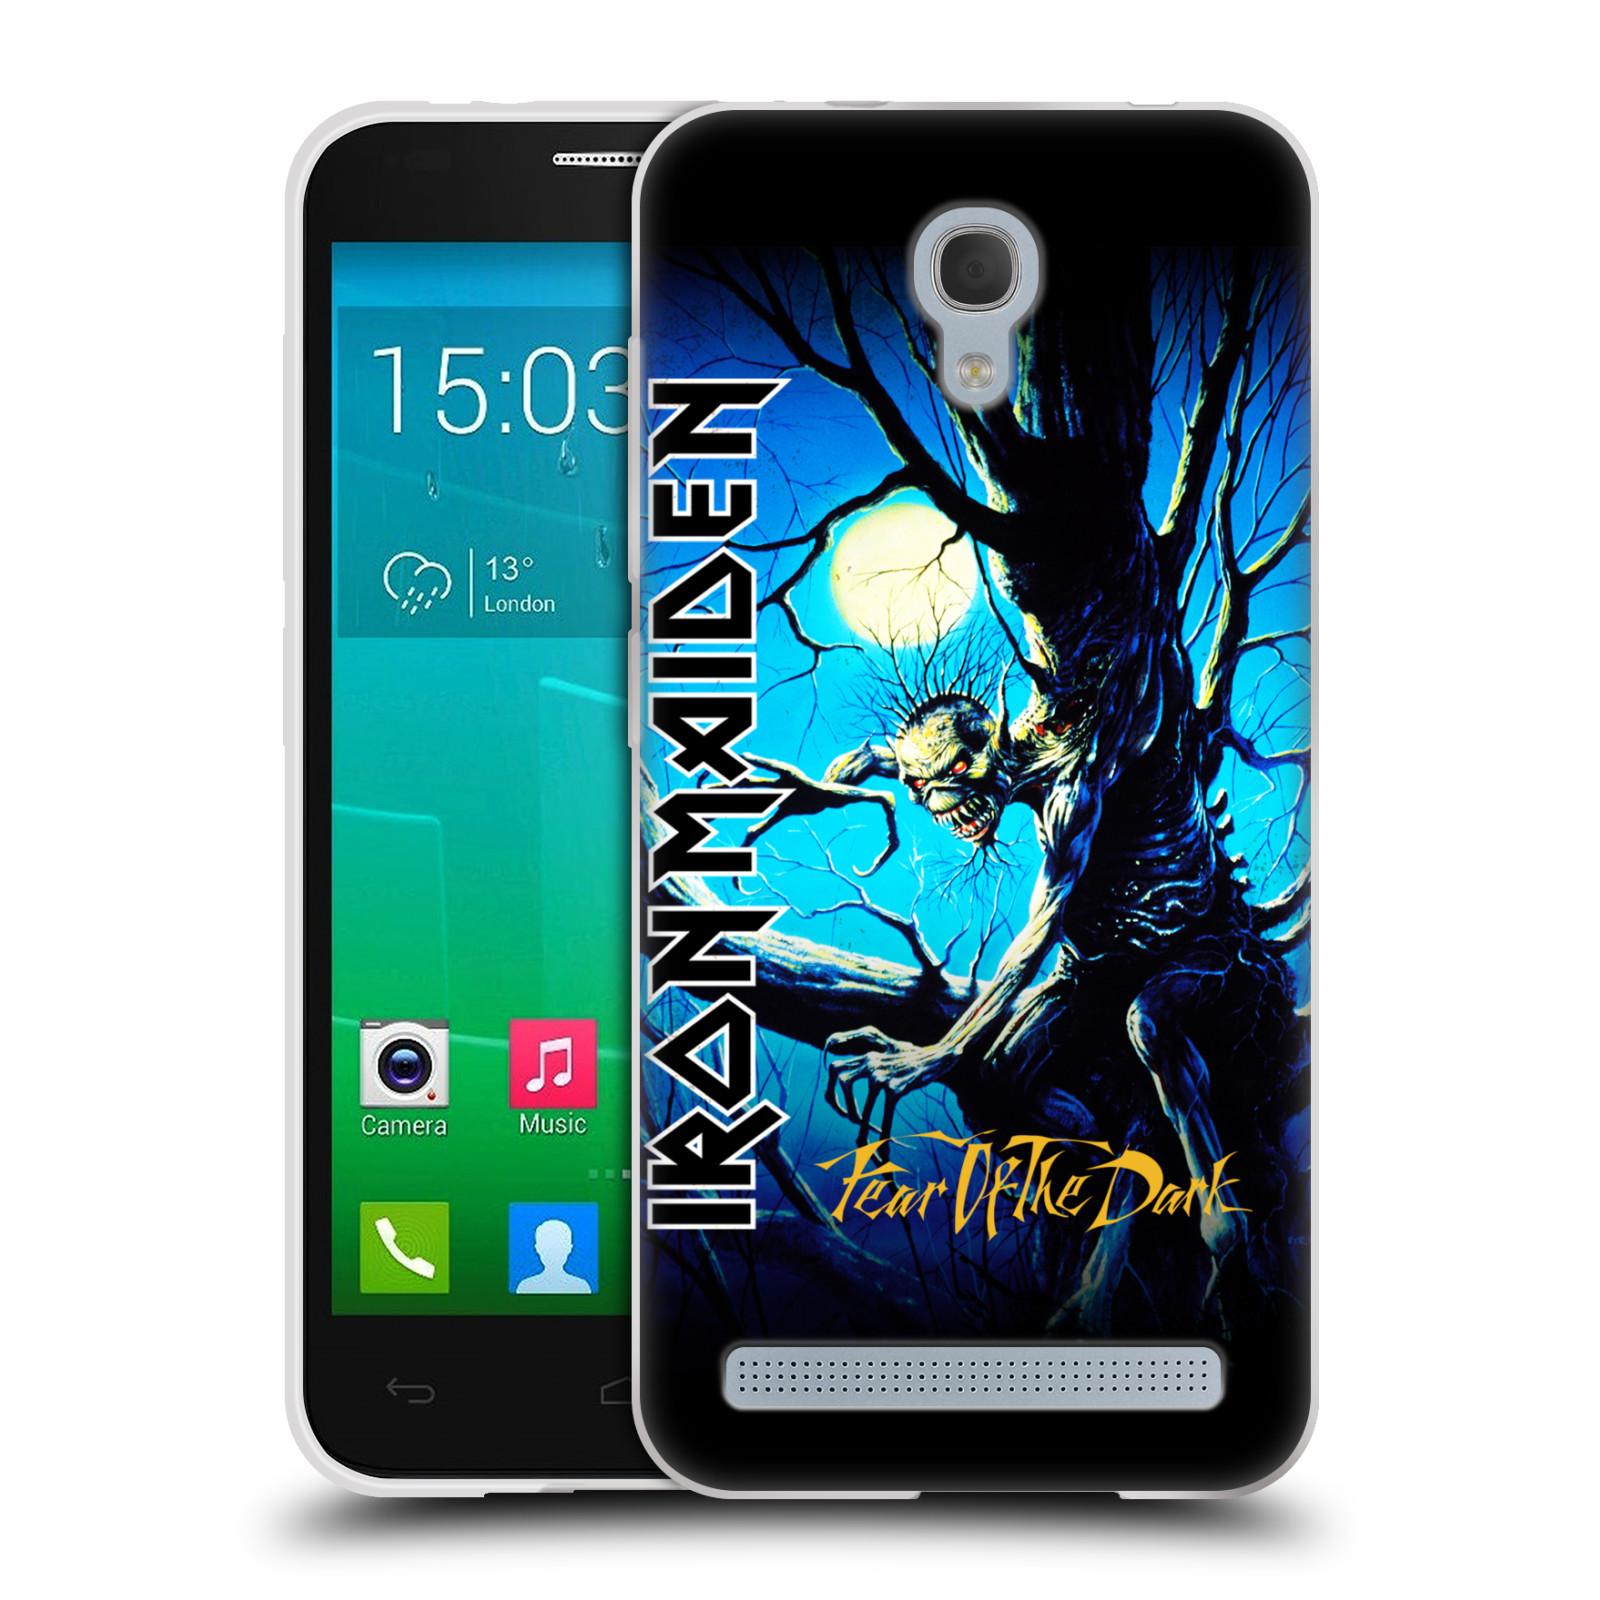 Silikonové pouzdro na mobil Alcatel One Touch Idol 2 Mini S 6036Y HEAD CASE - Iron Maiden - Fear Of The Dark (Silikonový kryt či obal na mobilní telefon s licencovaným motivem Iron Maiden Alcatel Idol 2 Mini S OT-6036Y)